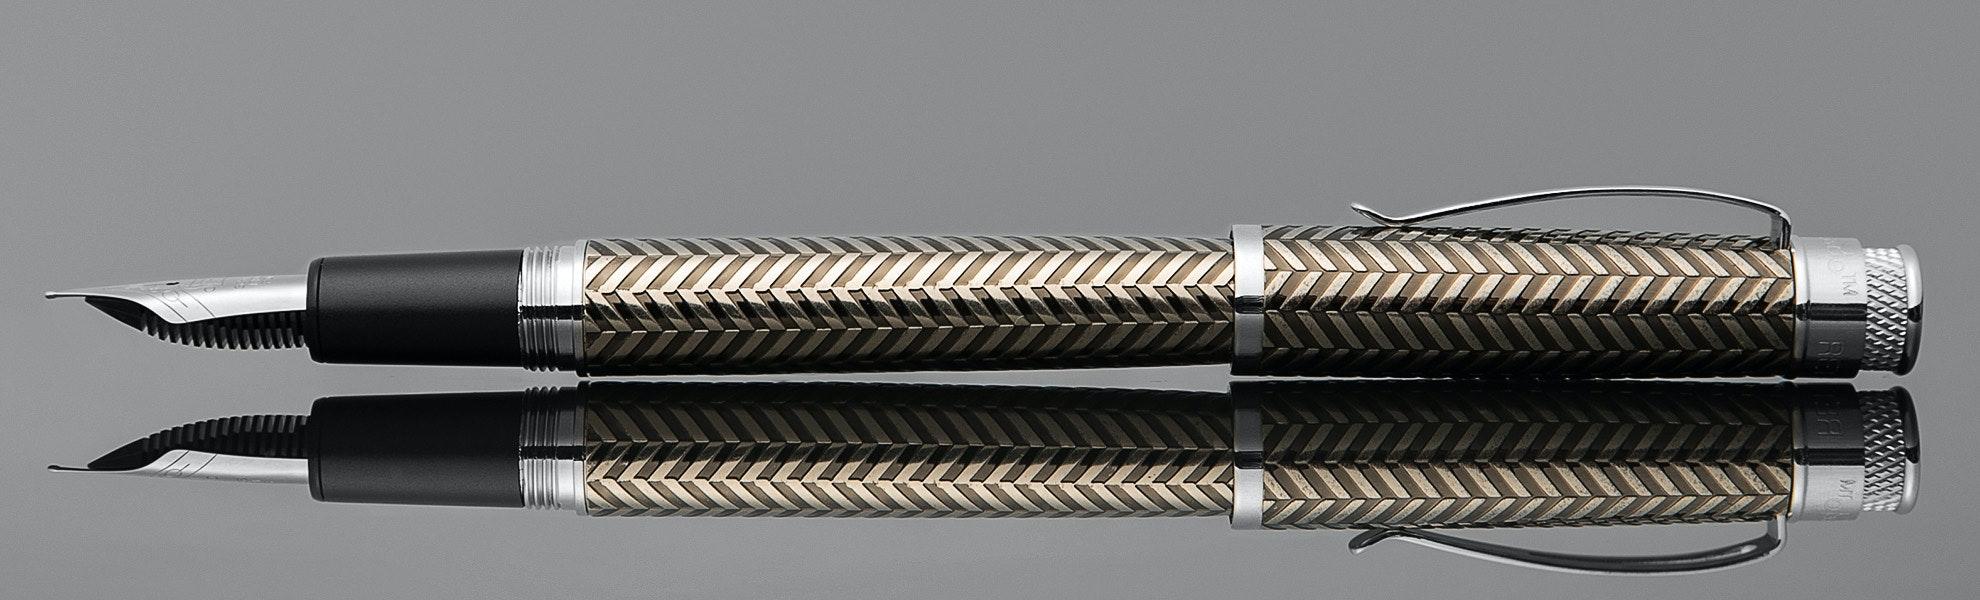 Retro 1951 Tornado Fountain Pen - Custom Edition